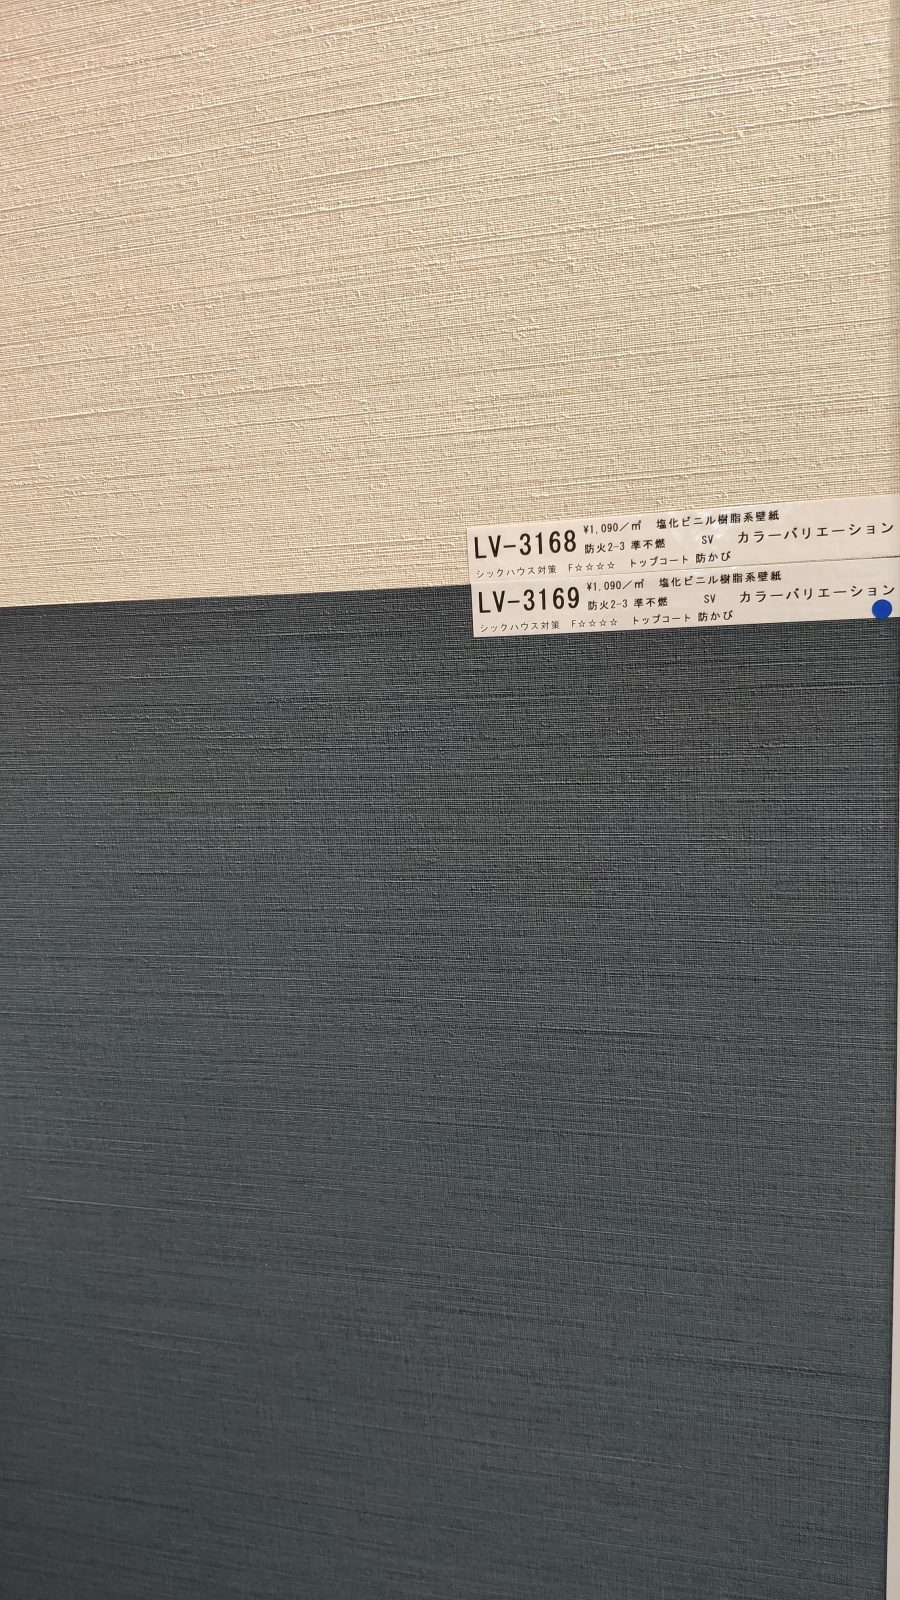 LV-3168 / LV-3169(LTS404)